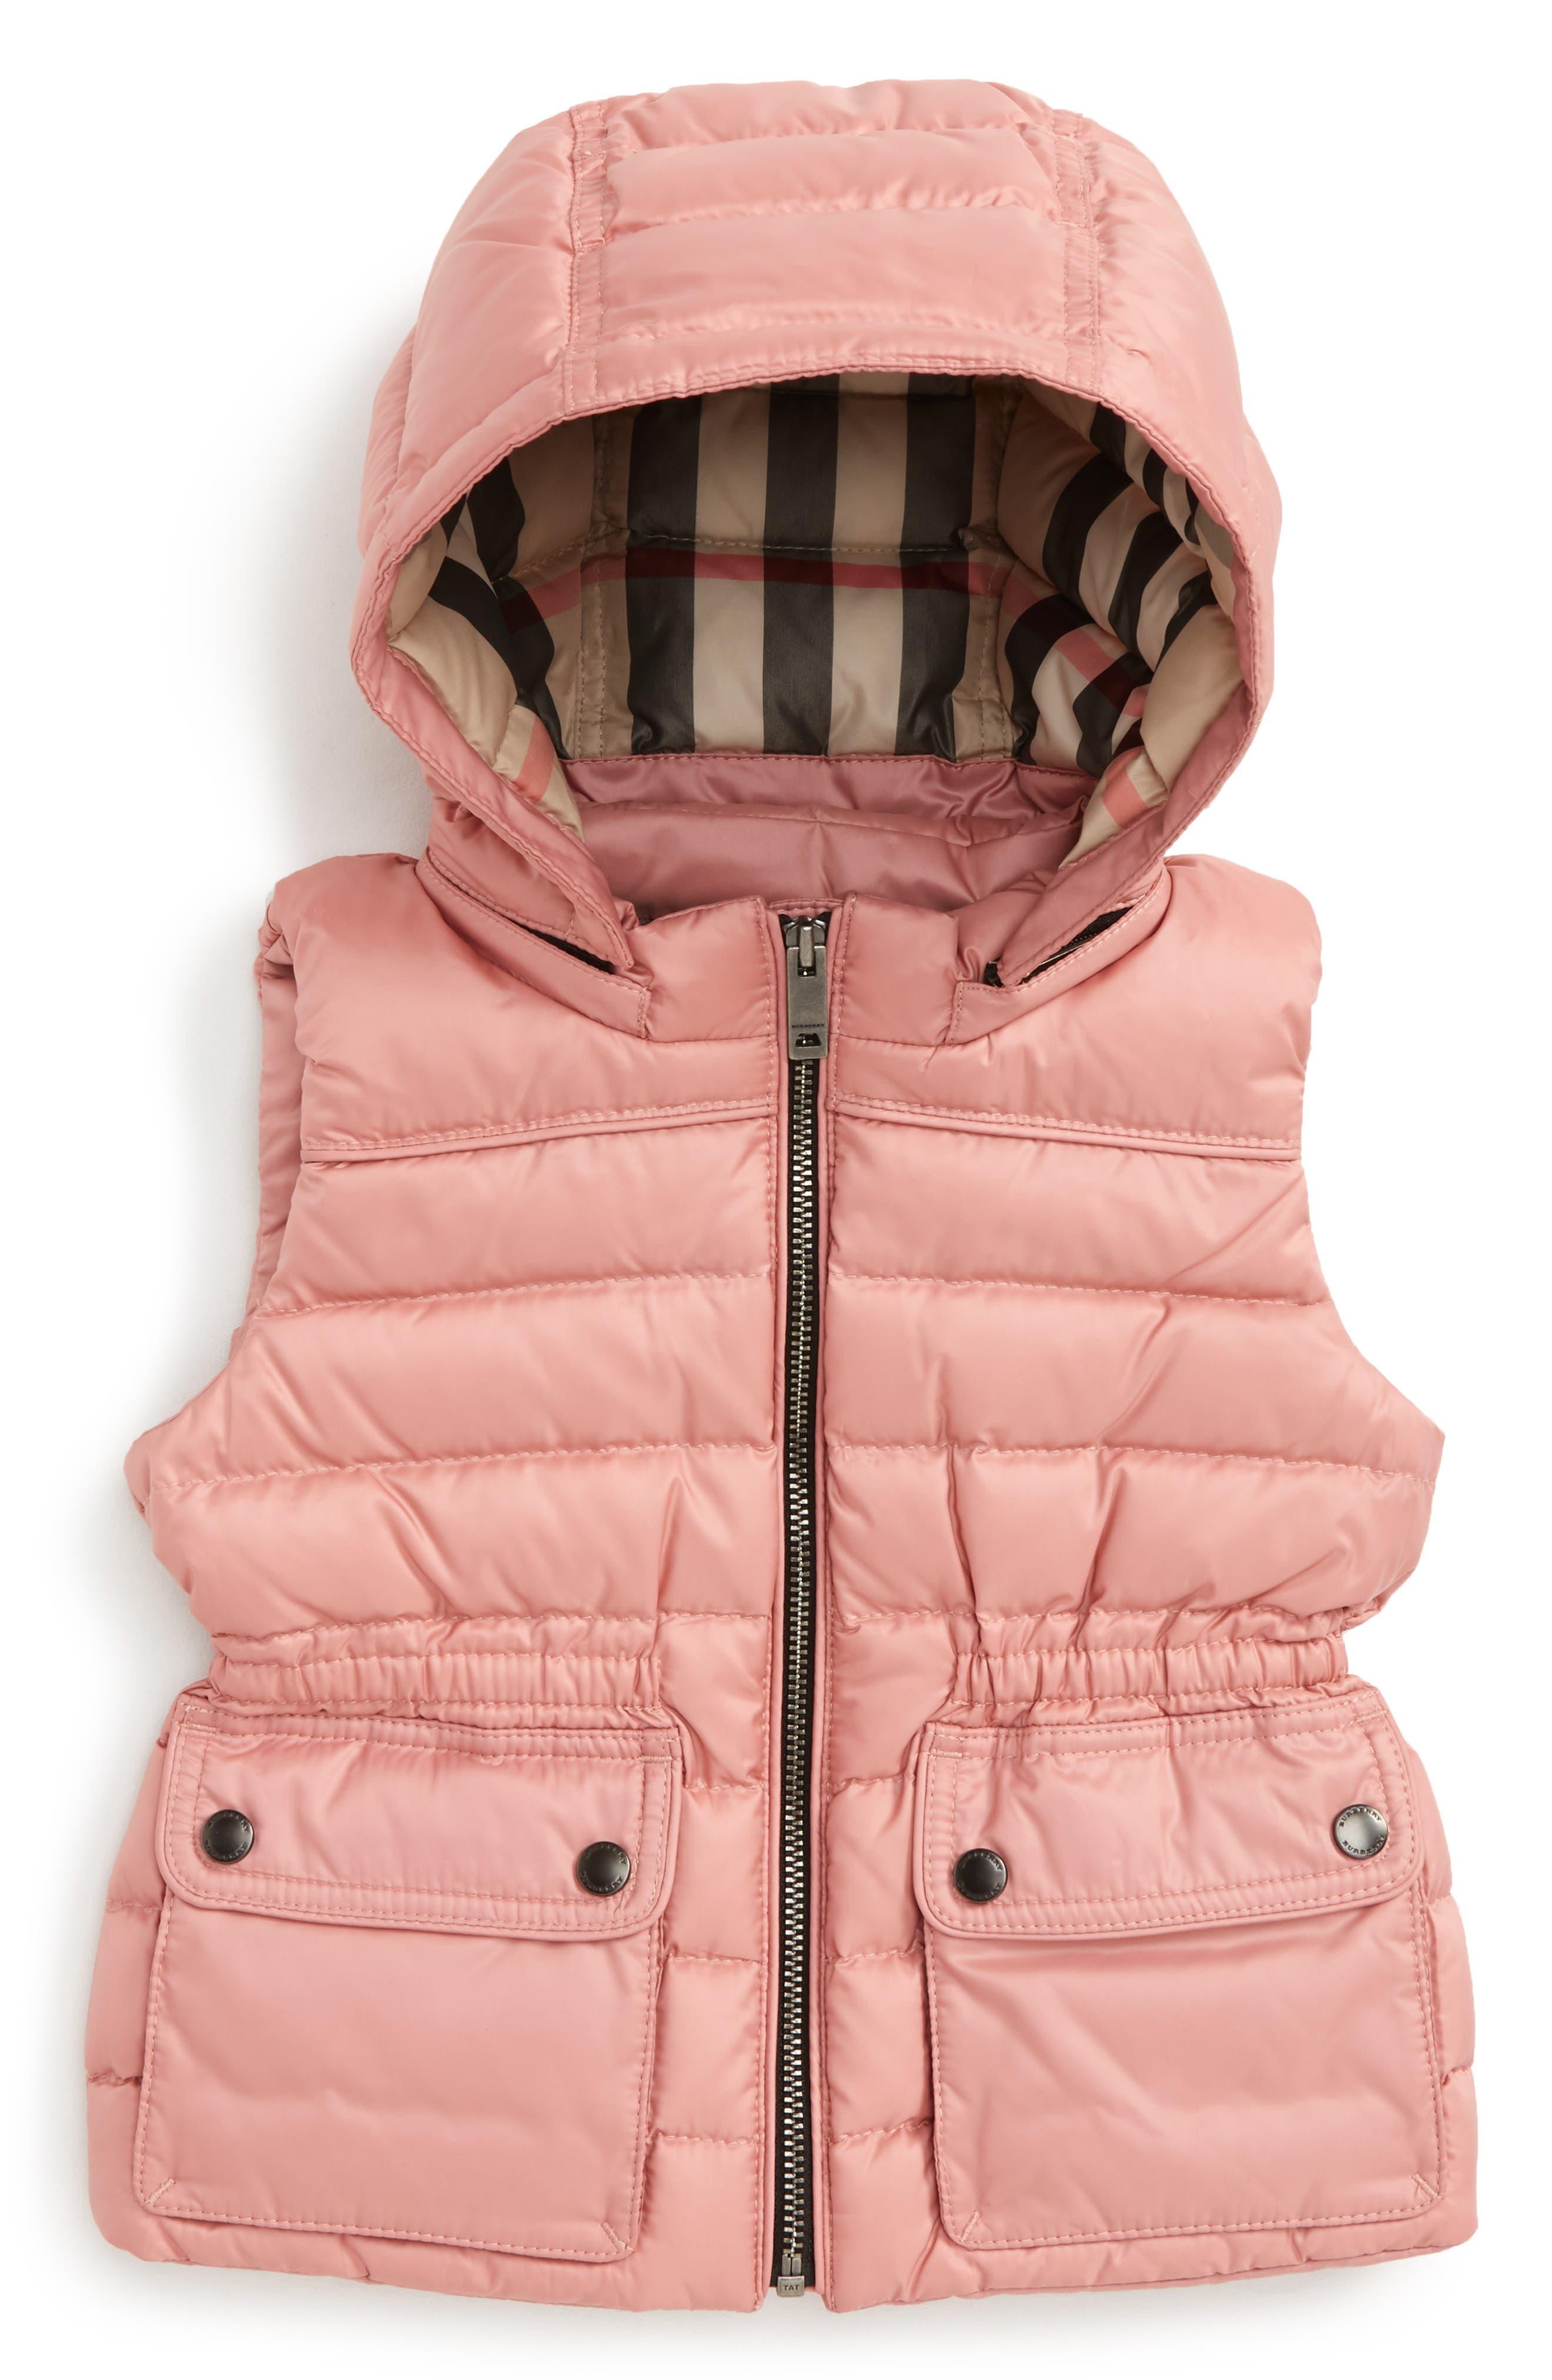 Main Image - Burberry Maggie Hooded Vest (Toddler Girls, Little Girls & Big Girls)